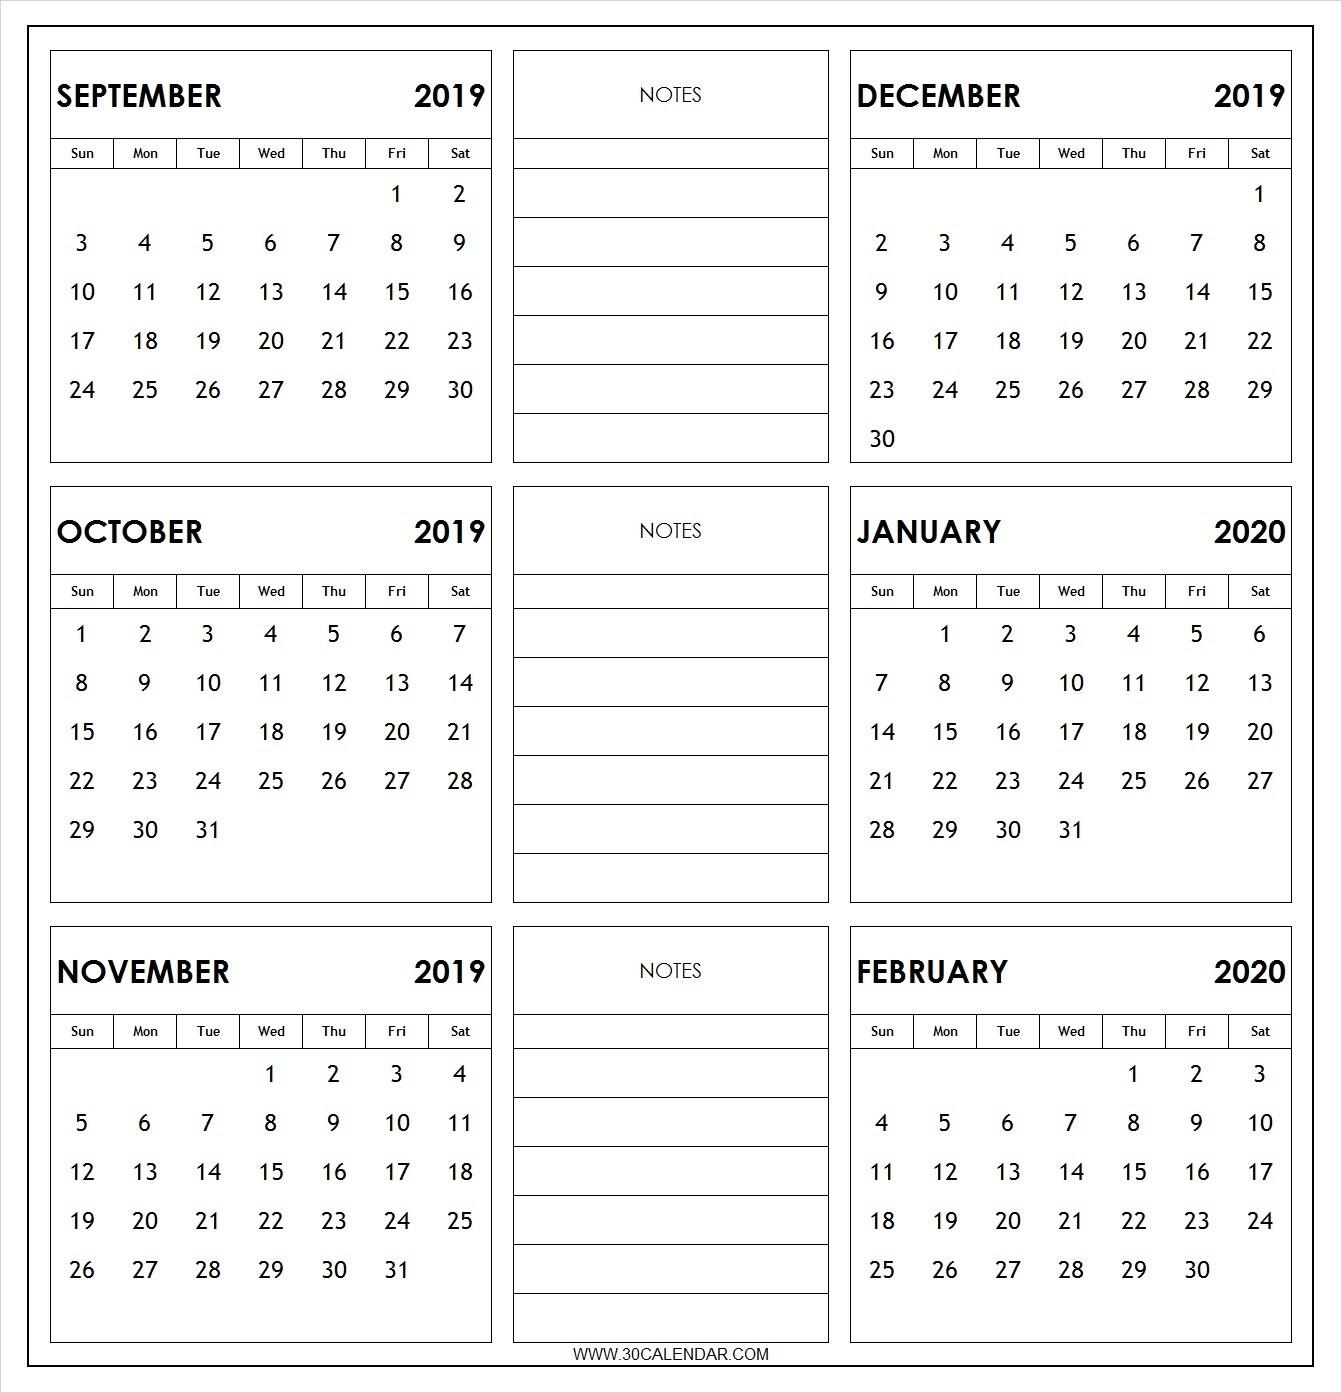 September 2019 To February 2020 Calendar Printable | 6 Month-6 Month Blank Calendar 2020